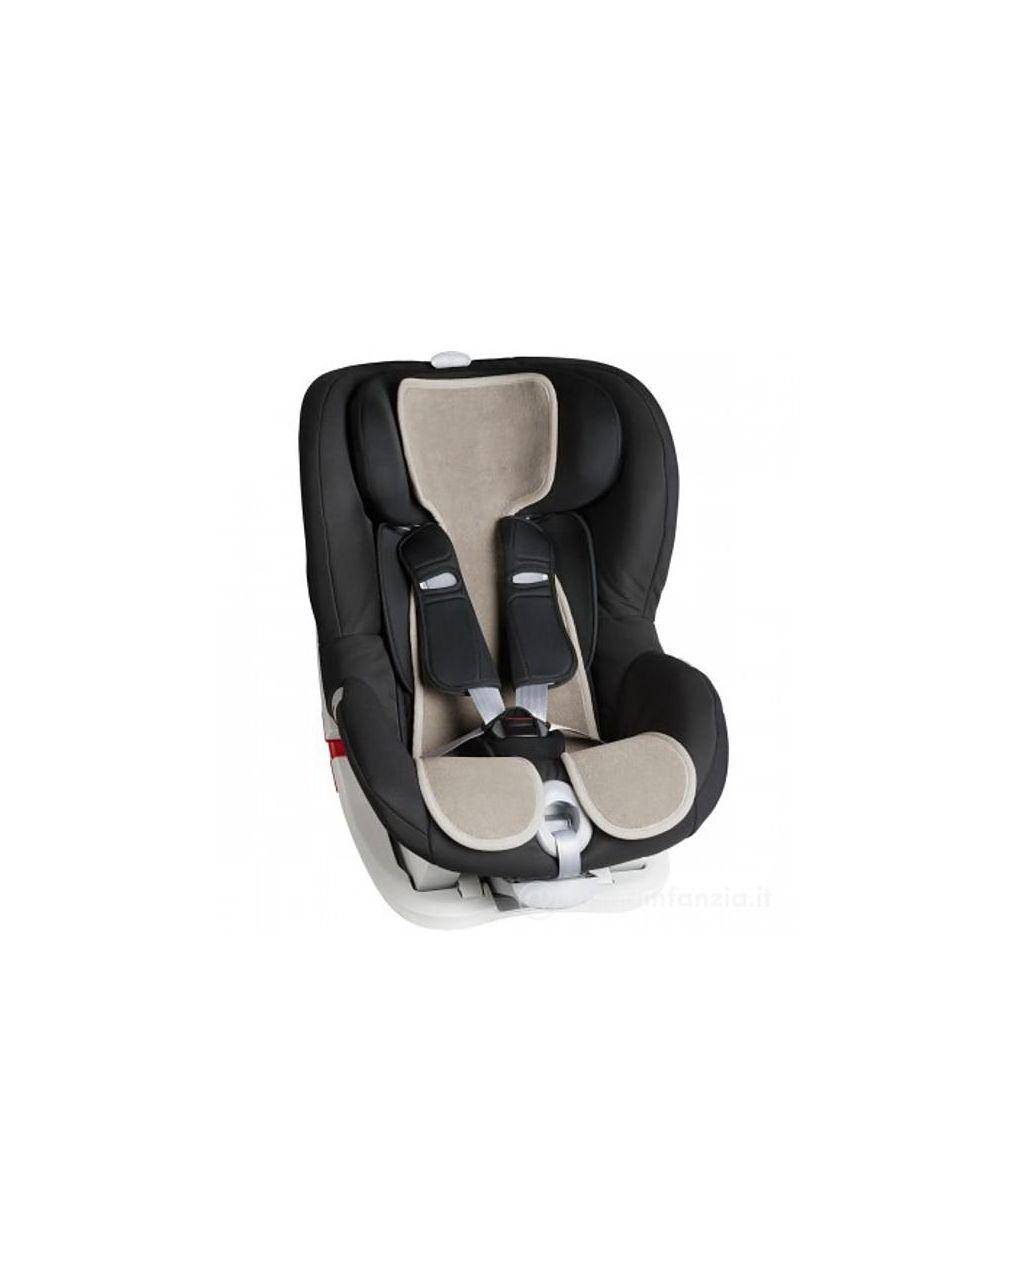 Aircuddle Κάλυμμα Καθίσματος Αυτοκινήτου Group 1 Cool Seat (9-18 Kg)